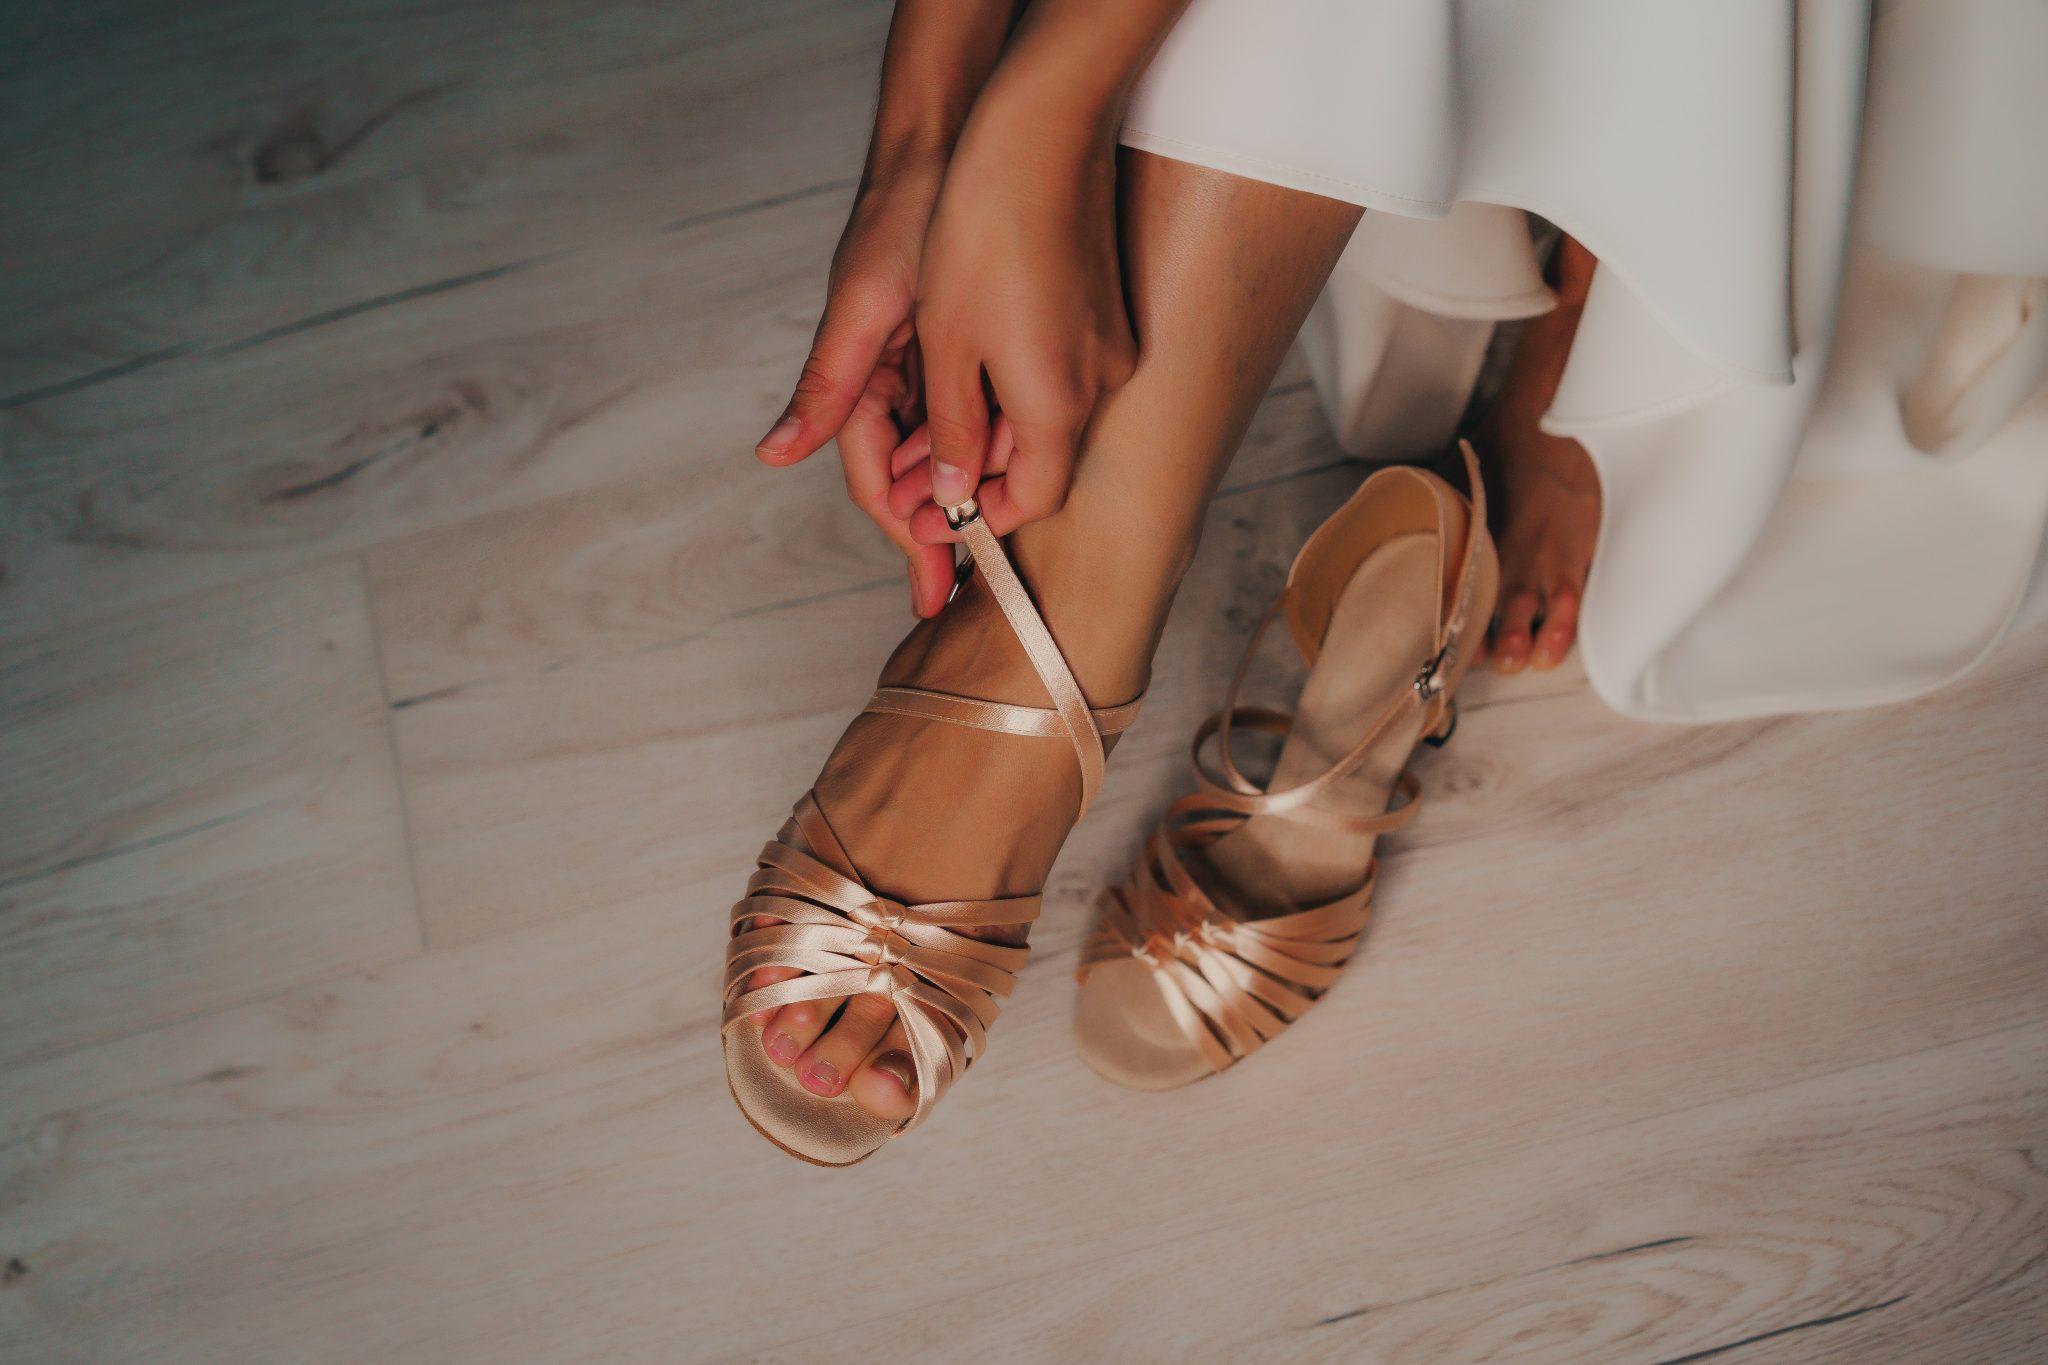 ako sa starat o tanecne topanky